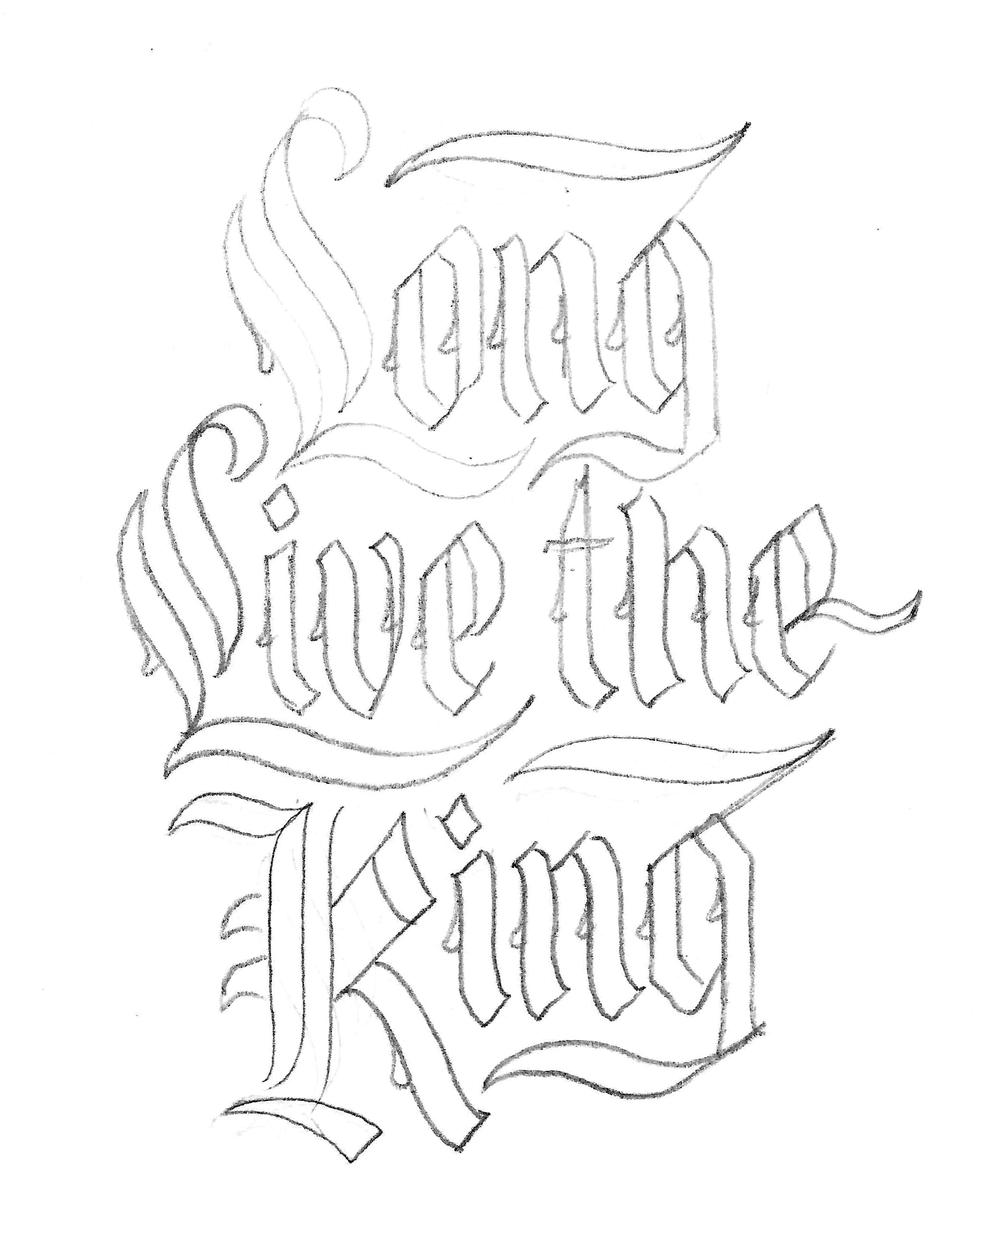 LongLivetheKing-RoughSketch2.png